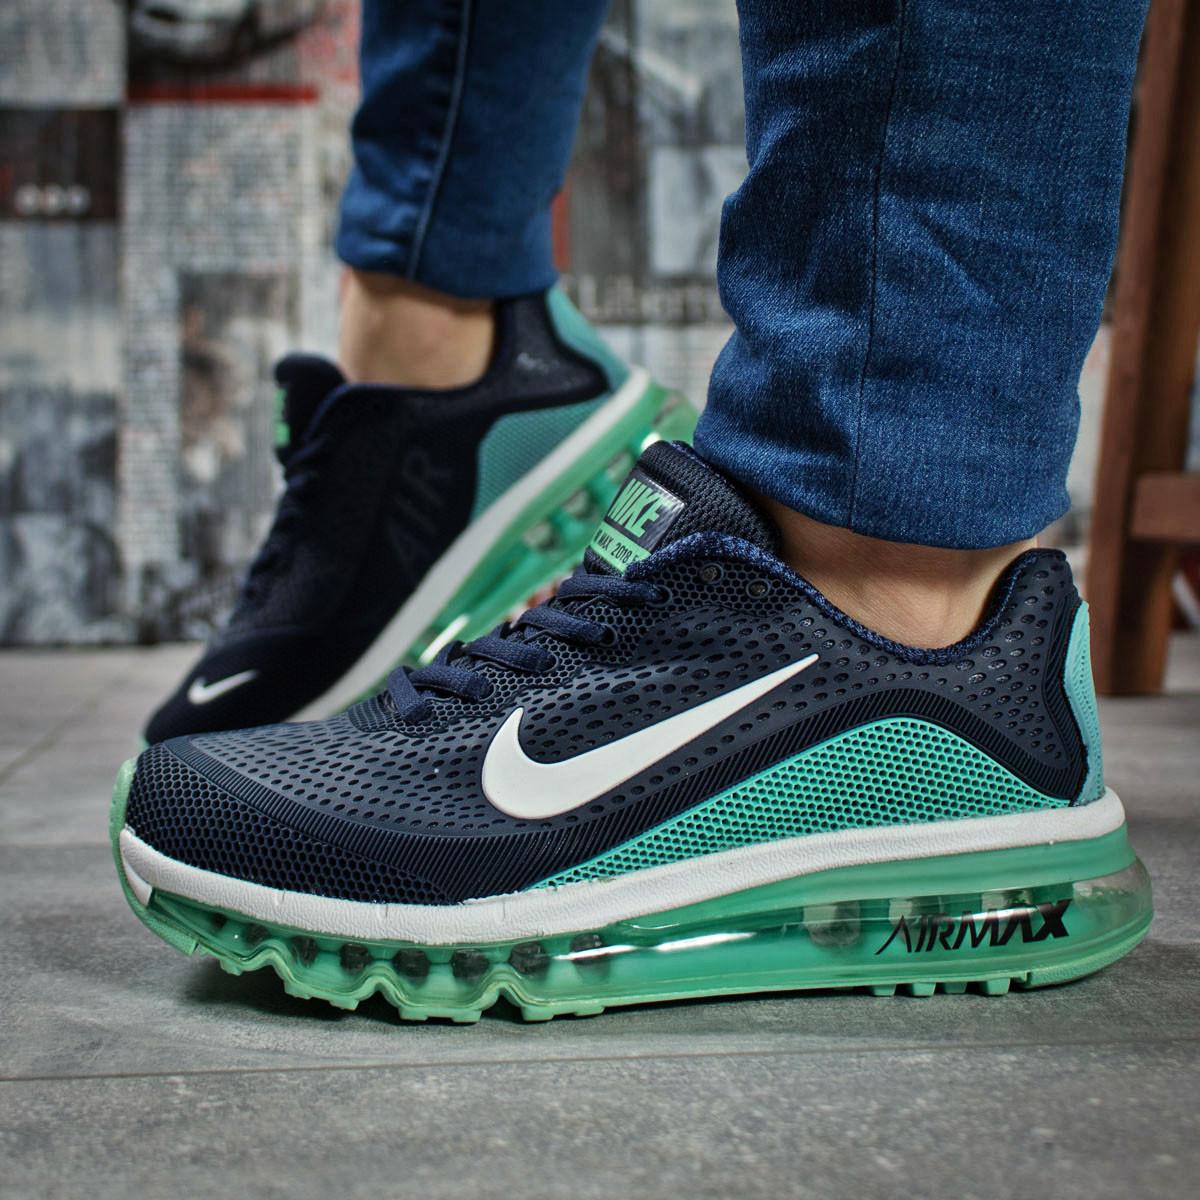 beedde51 Кроссовки женские Nike Air Max, темно-синие (15504) размеры в наличии ▻